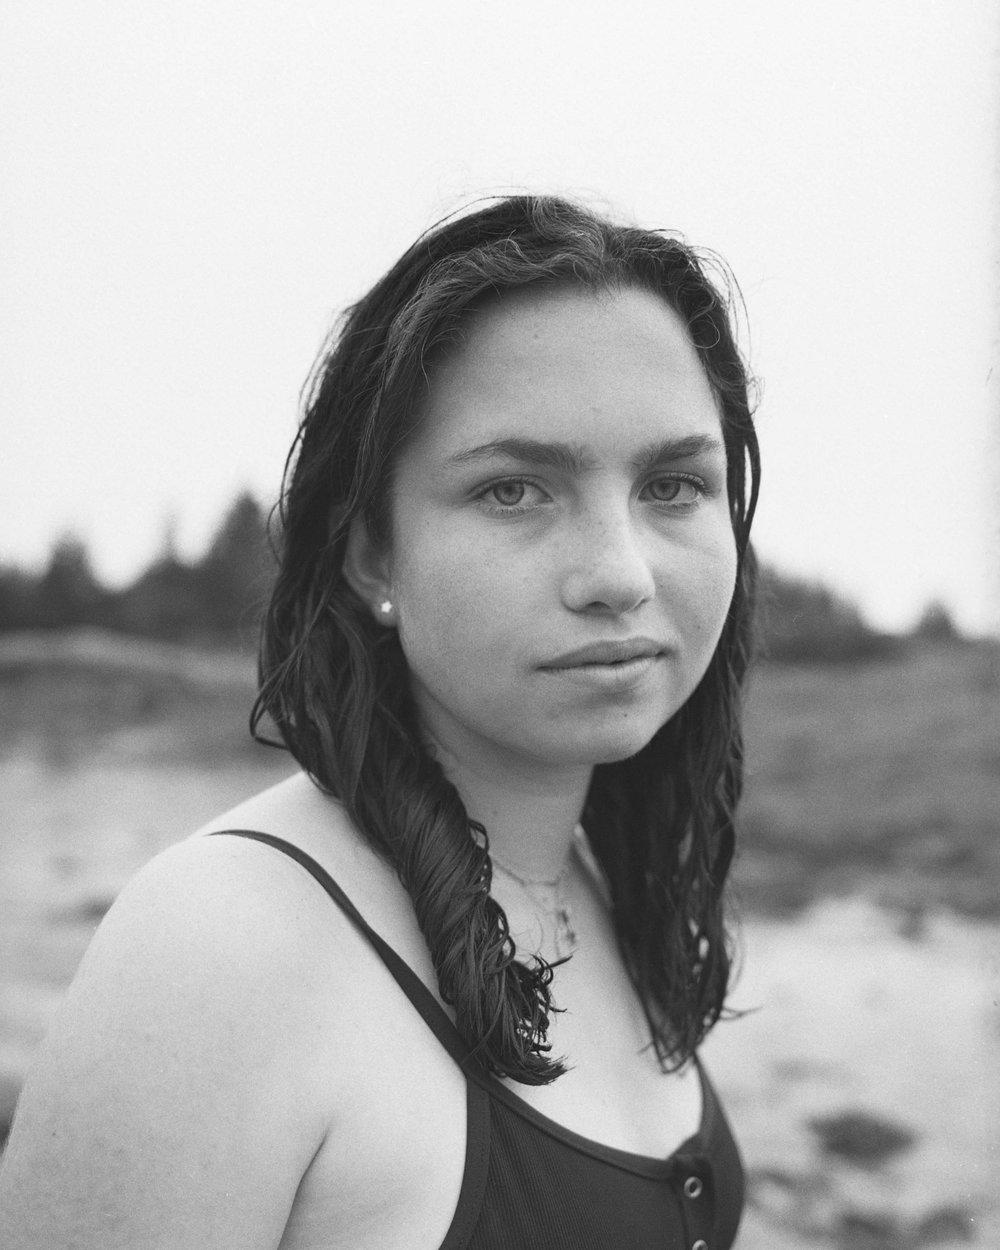 Portraits_Maine_2018_12.jpg